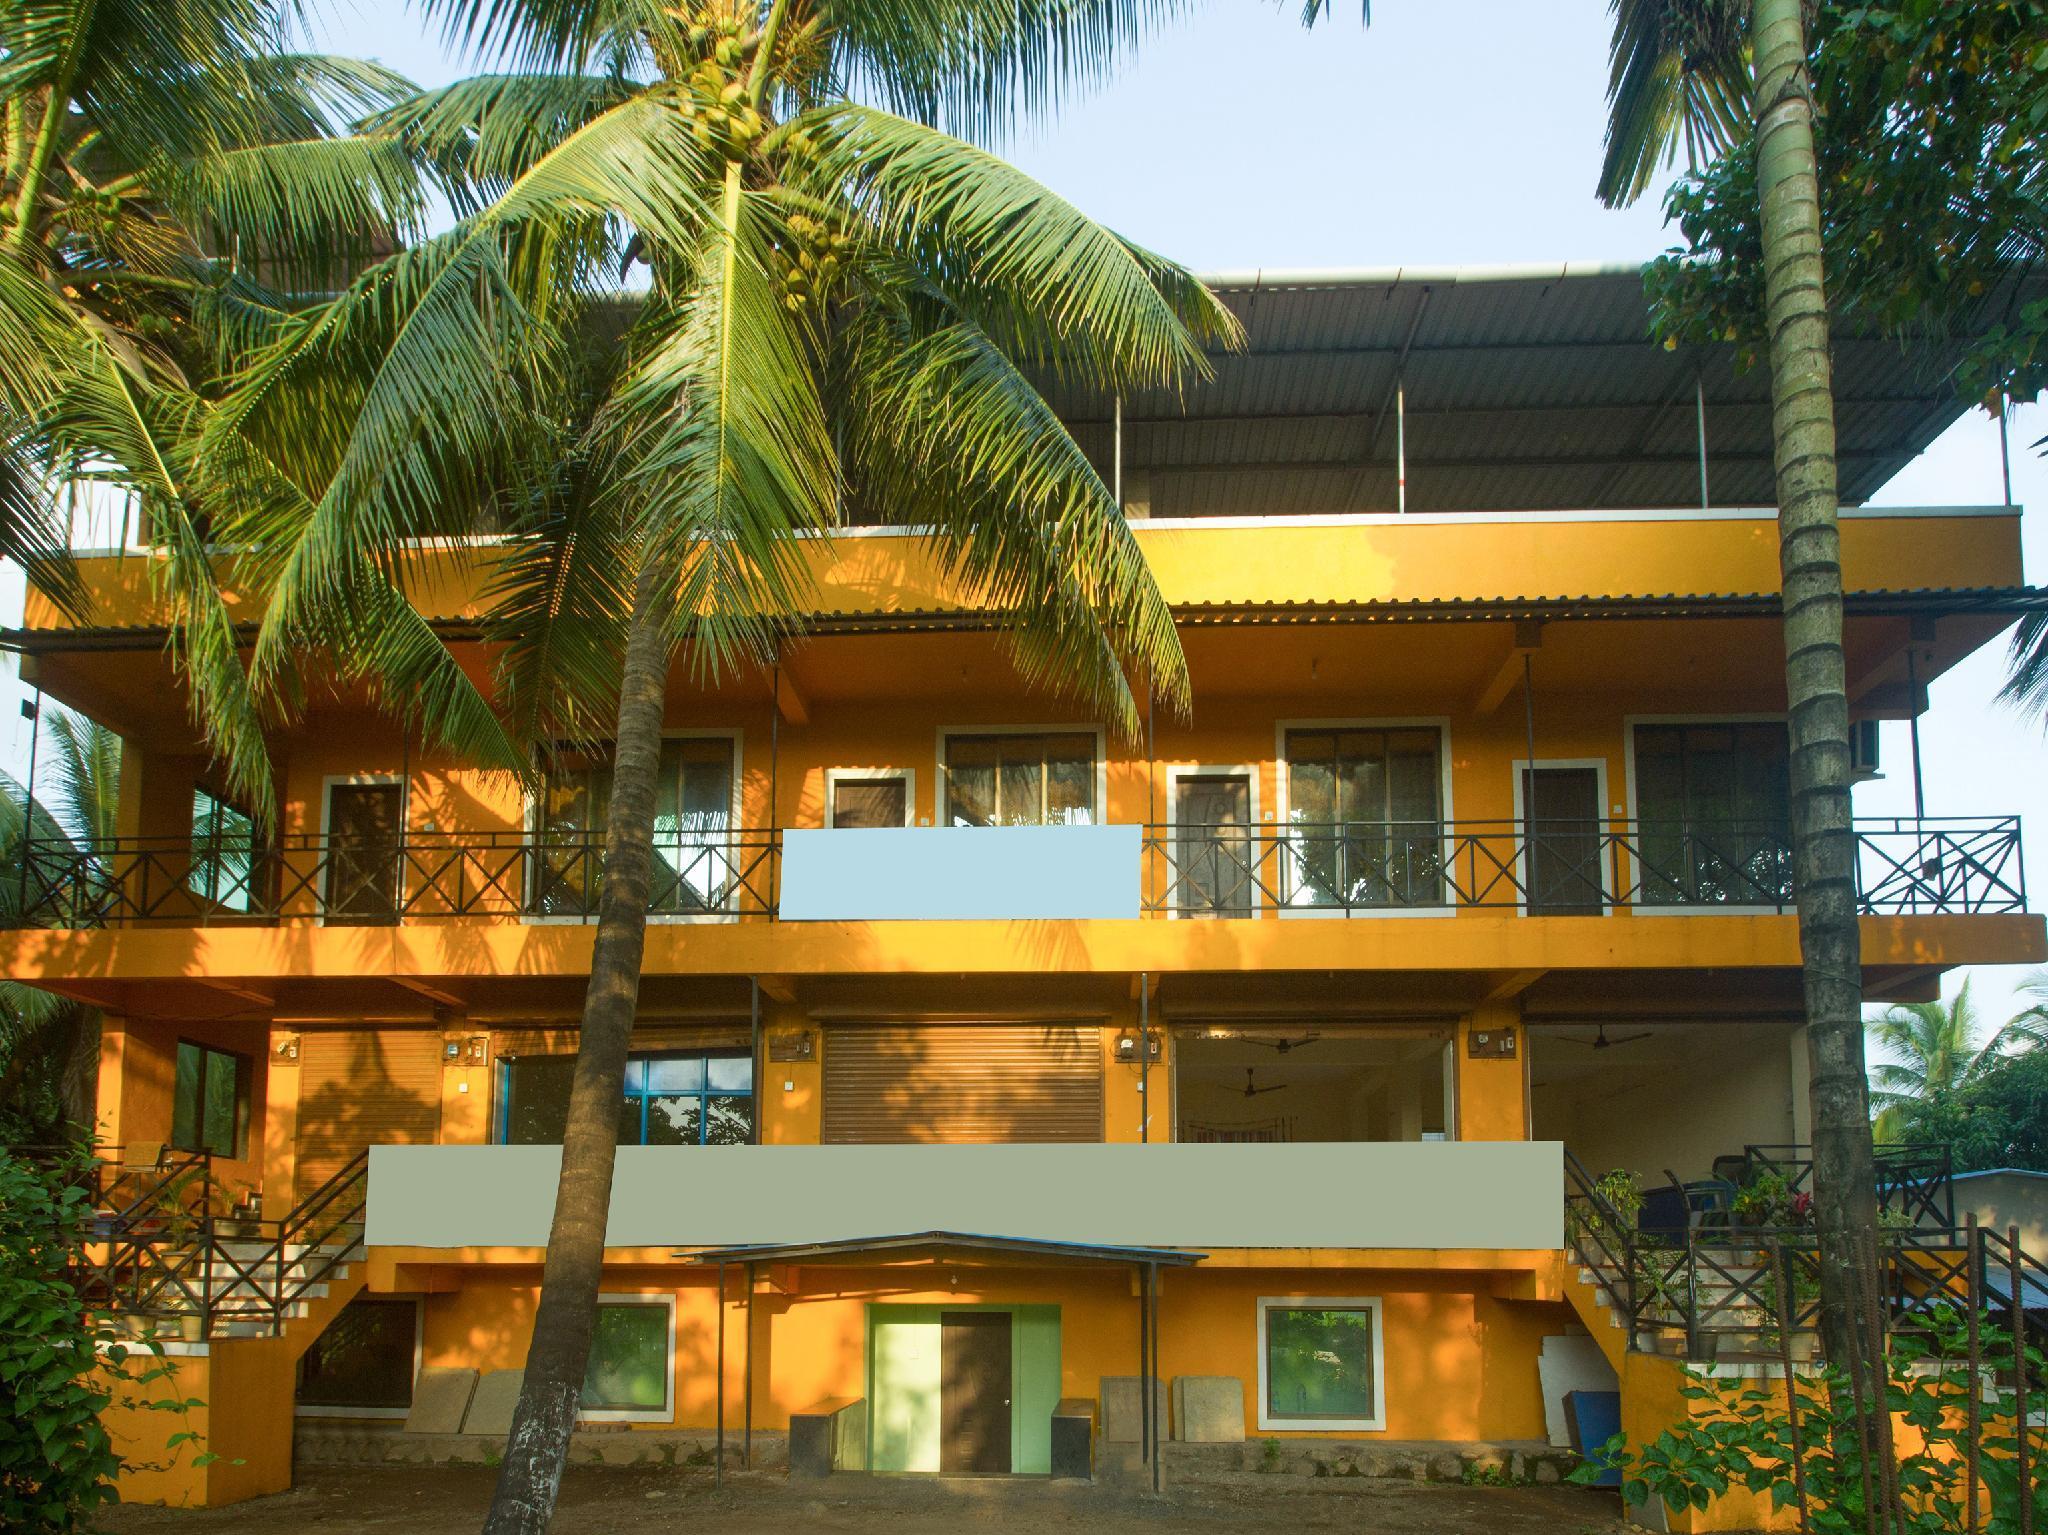 OYO 19512 Pednekar's Home Stay, Raigarh